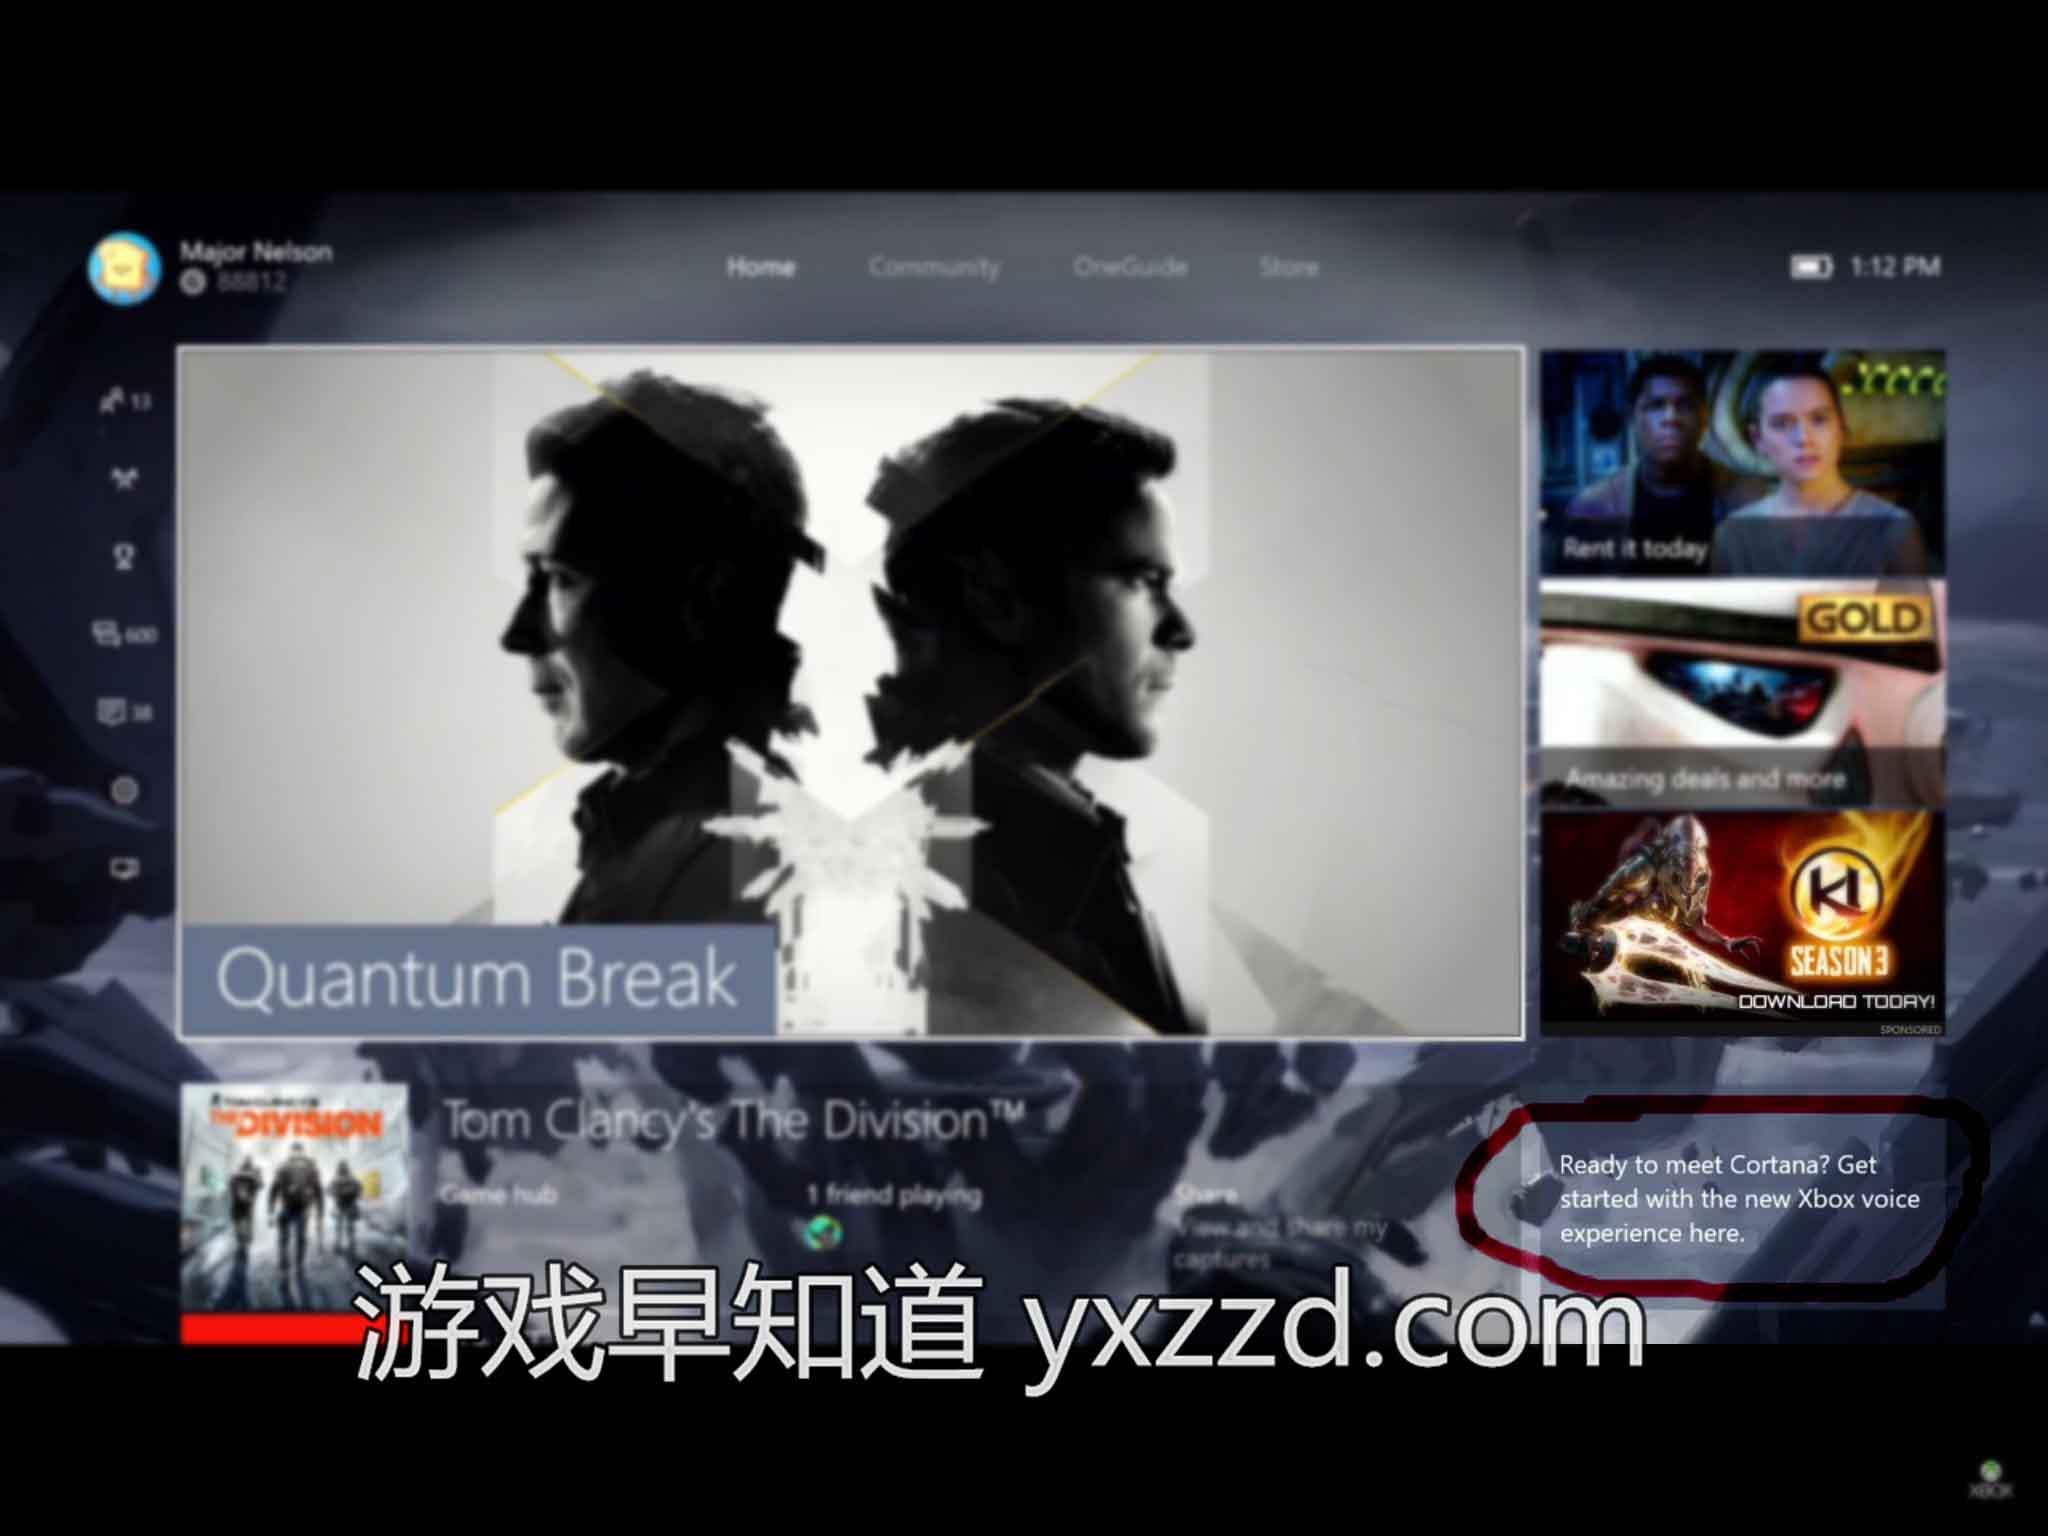 xboxone Cortana